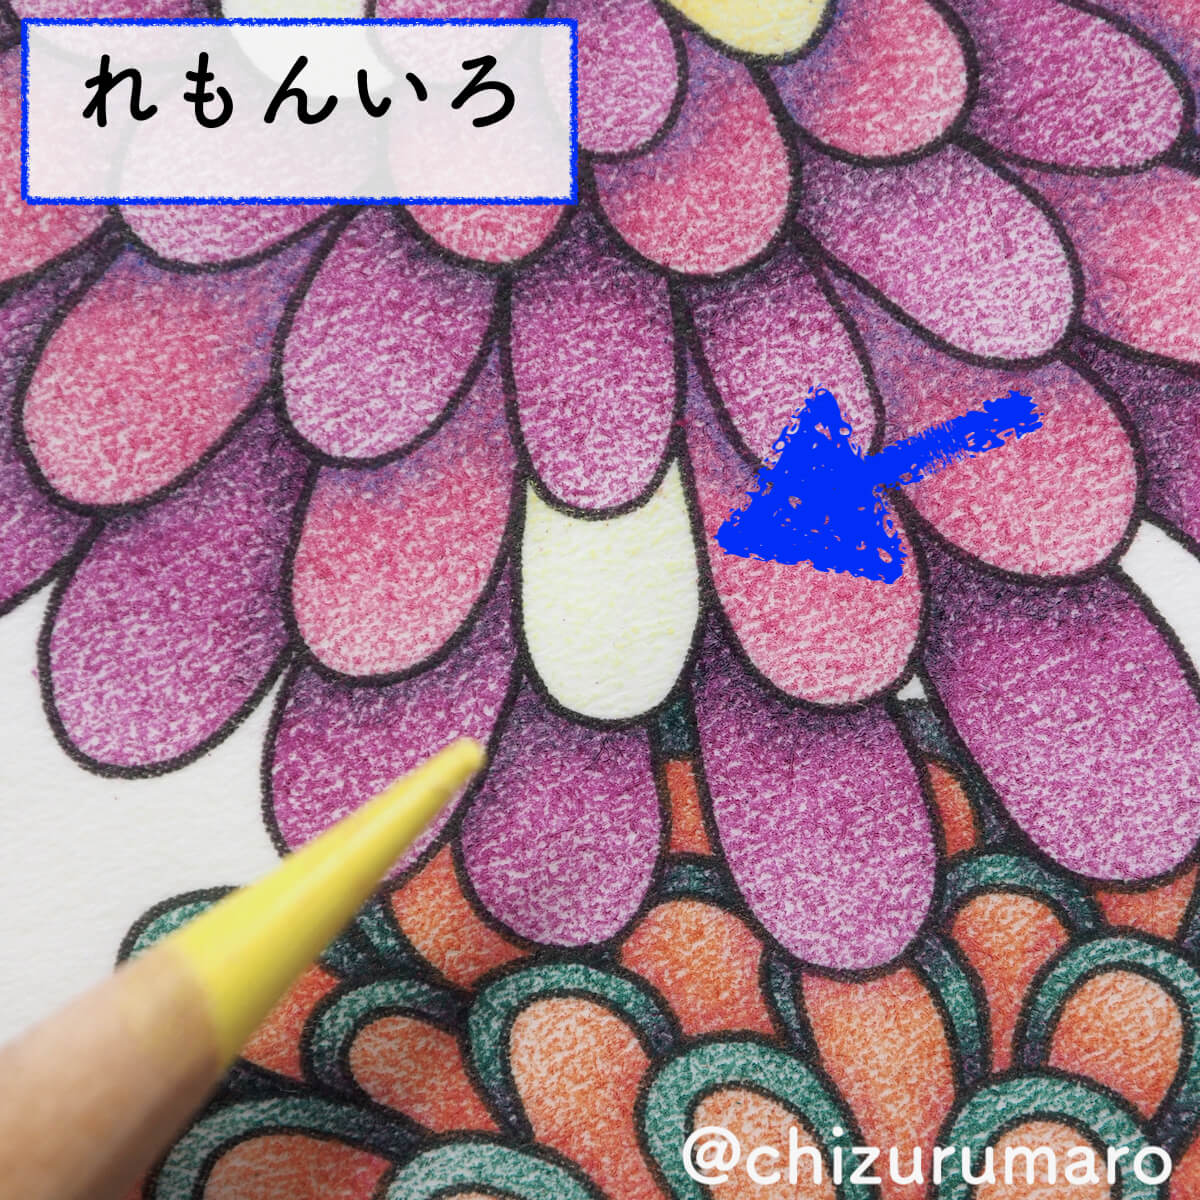 f:id:chizurumaro:20200415165905j:plain